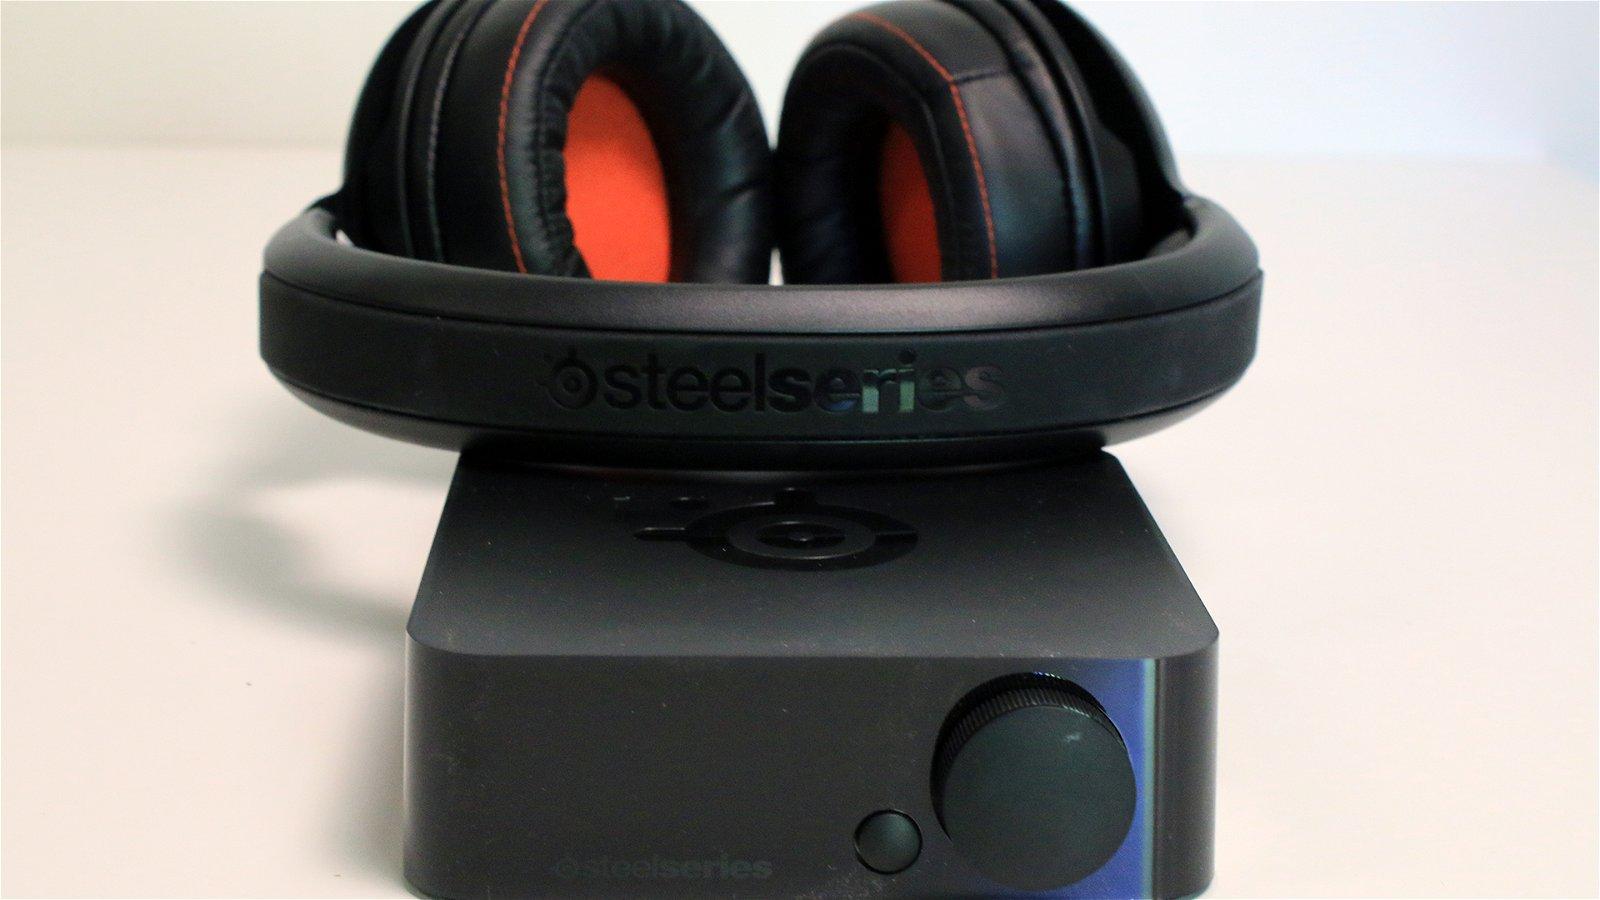 Steelseries Siberia 800 Gaming Headset (Hardware) Review 4